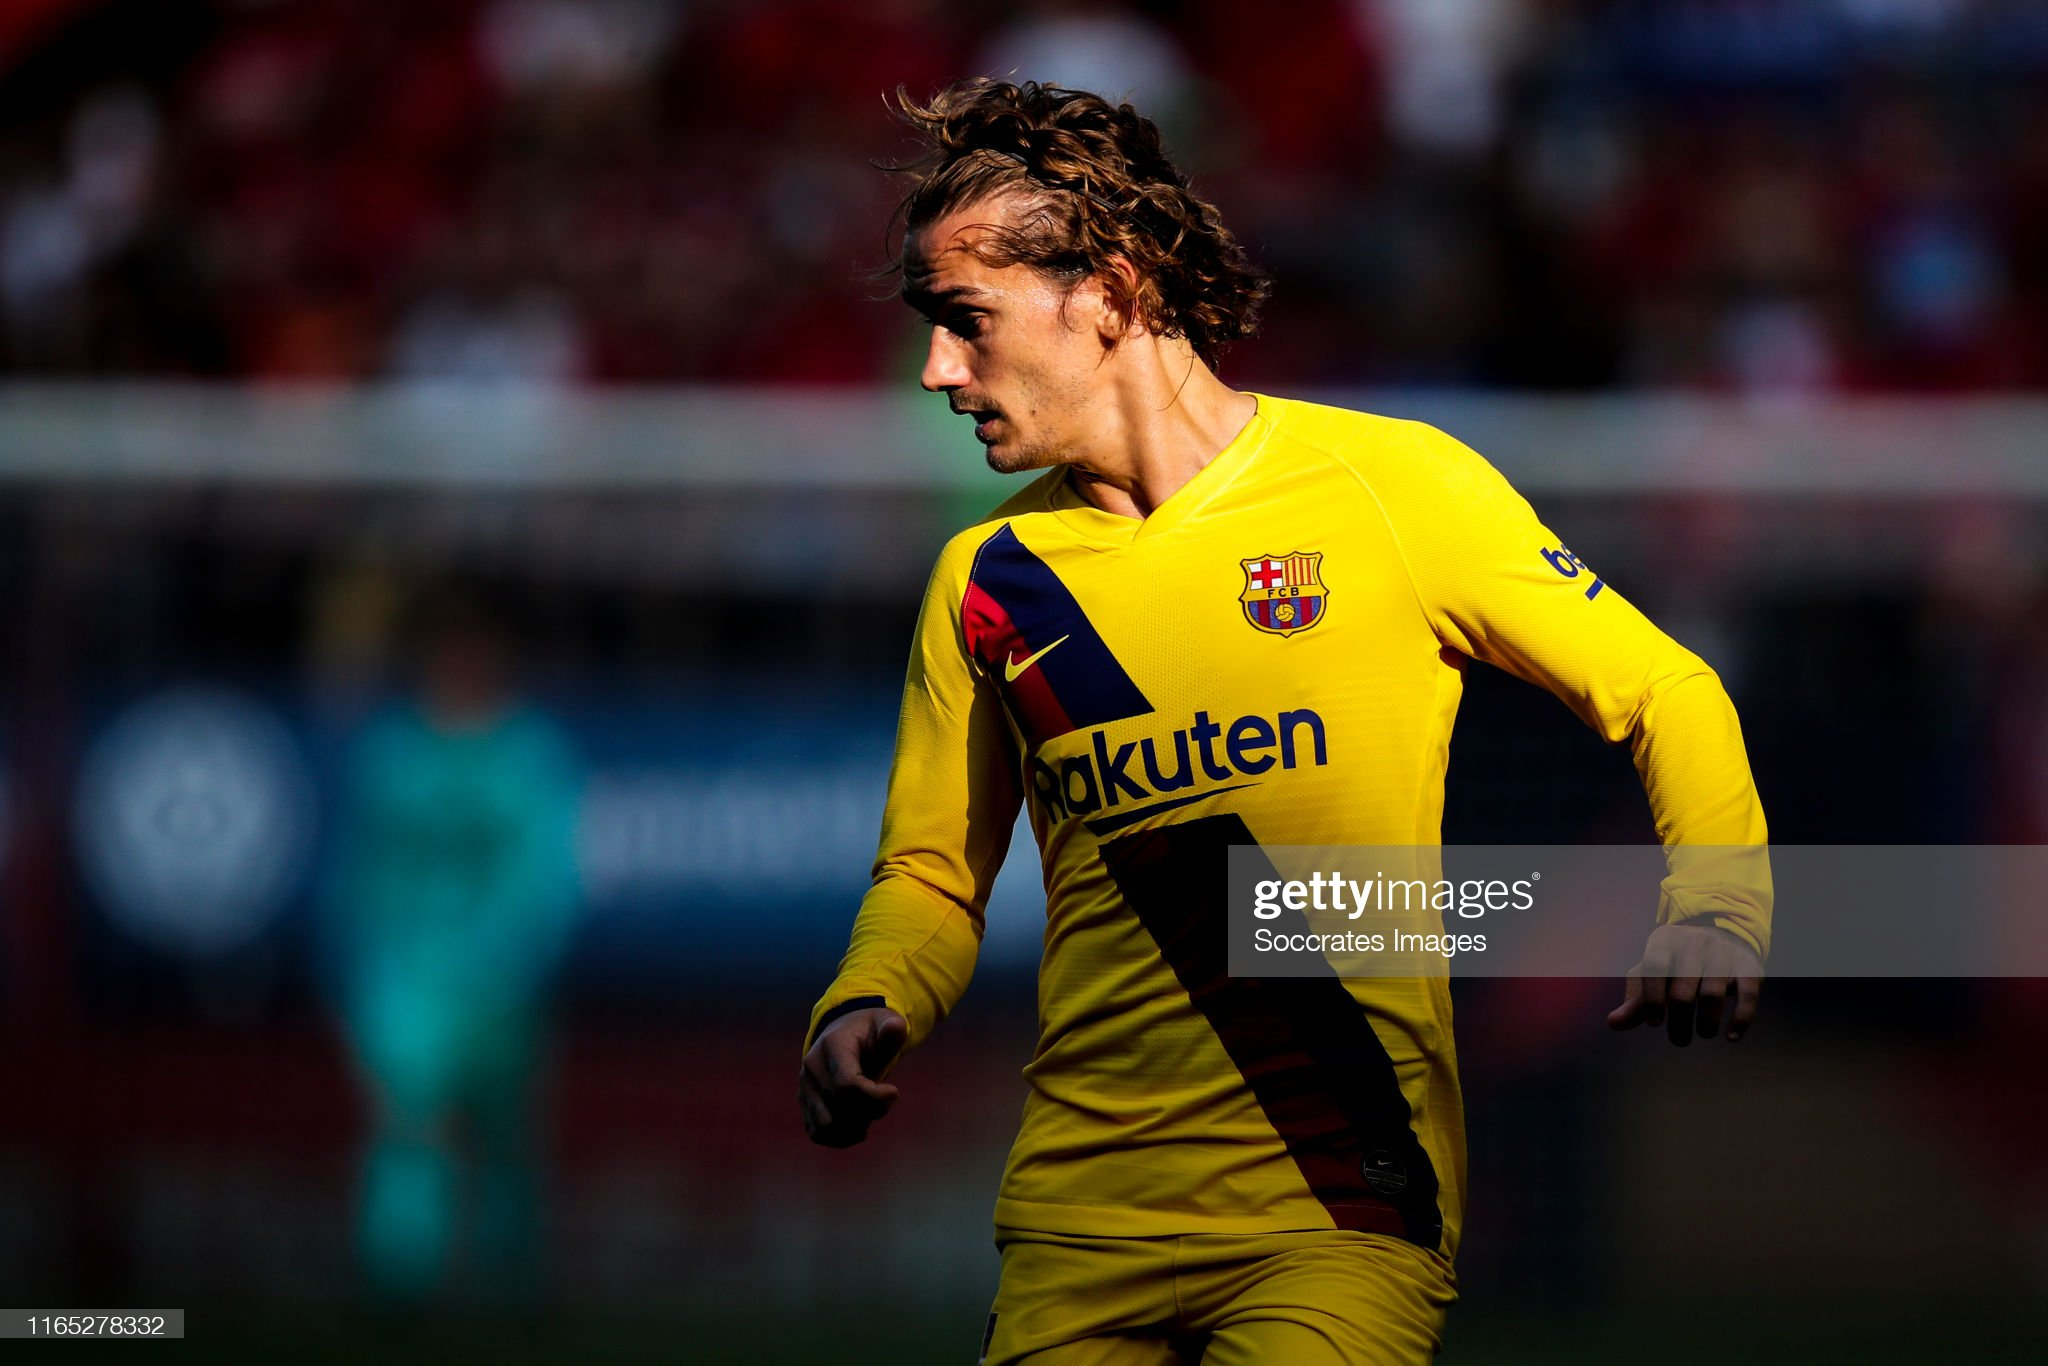 صور مباراة : أوساسونا - برشلونة 2-2 ( 31-08-2019 )  Antoine-griezmann-of-fc-barcelona-during-the-la-liga-santander-match-picture-id1165278332?s=2048x2048